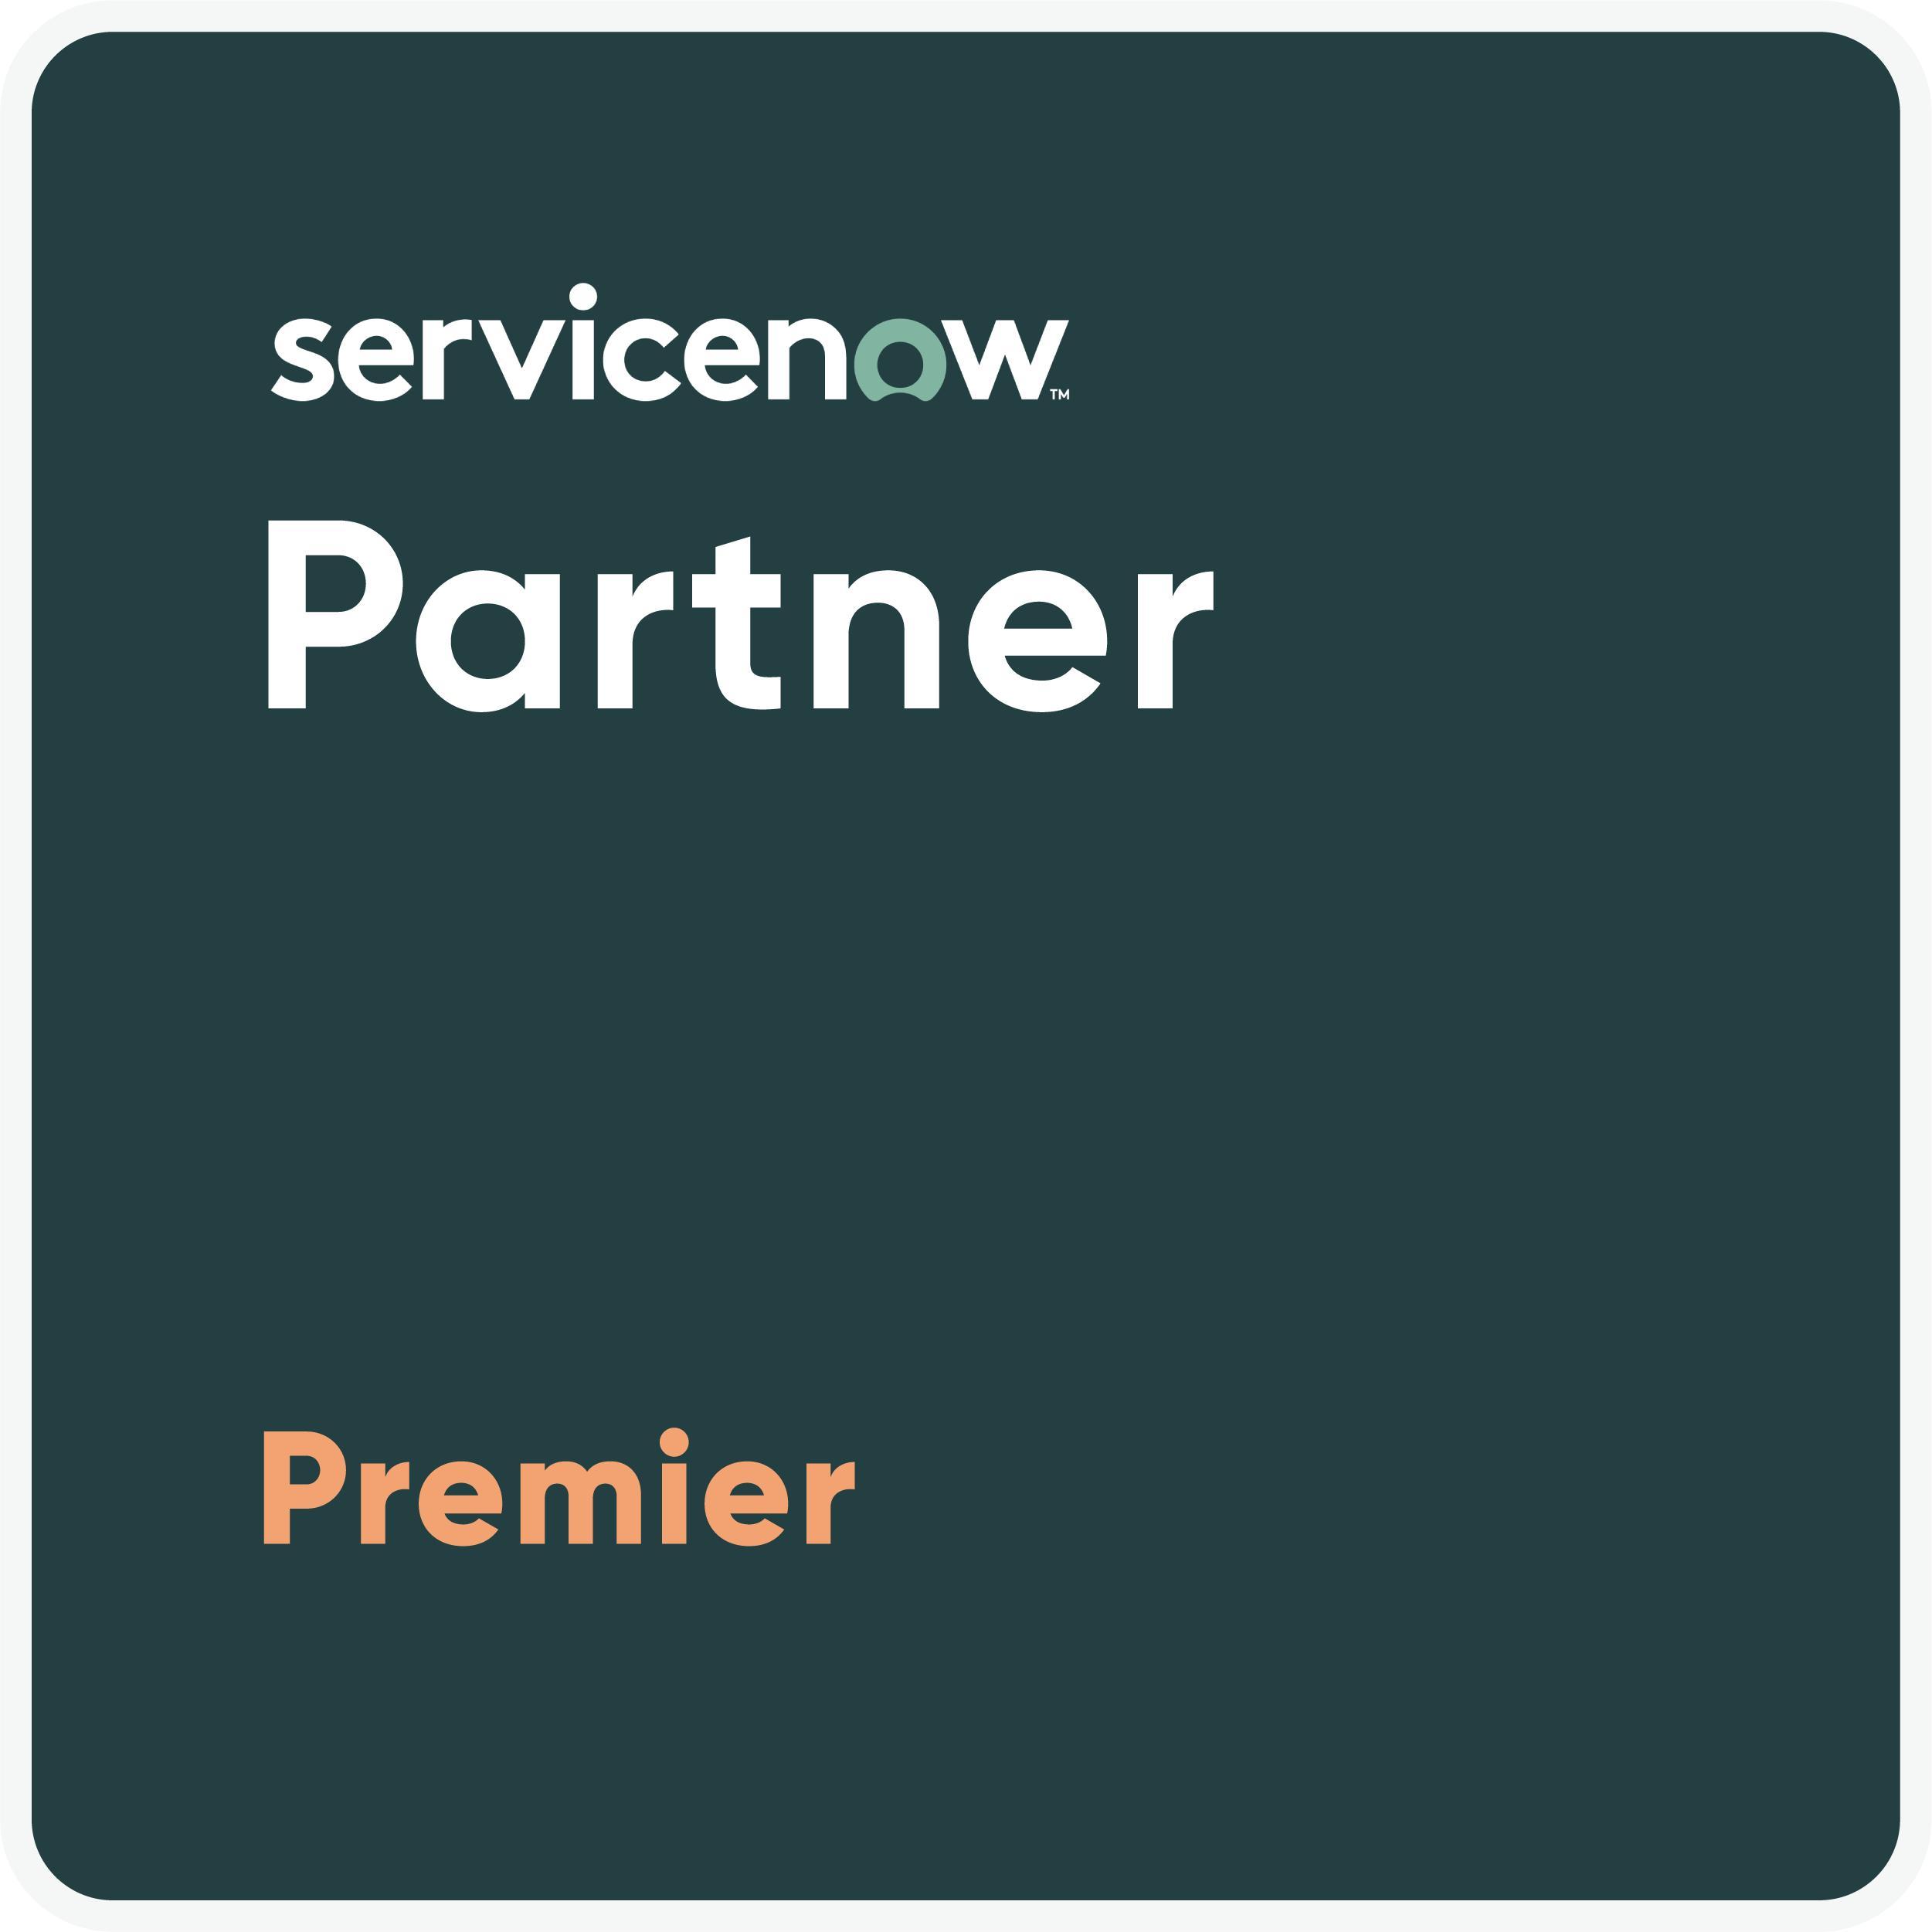 Intelibliss Ltd Transitions to ServiceNow's Premier Partner Program Segment